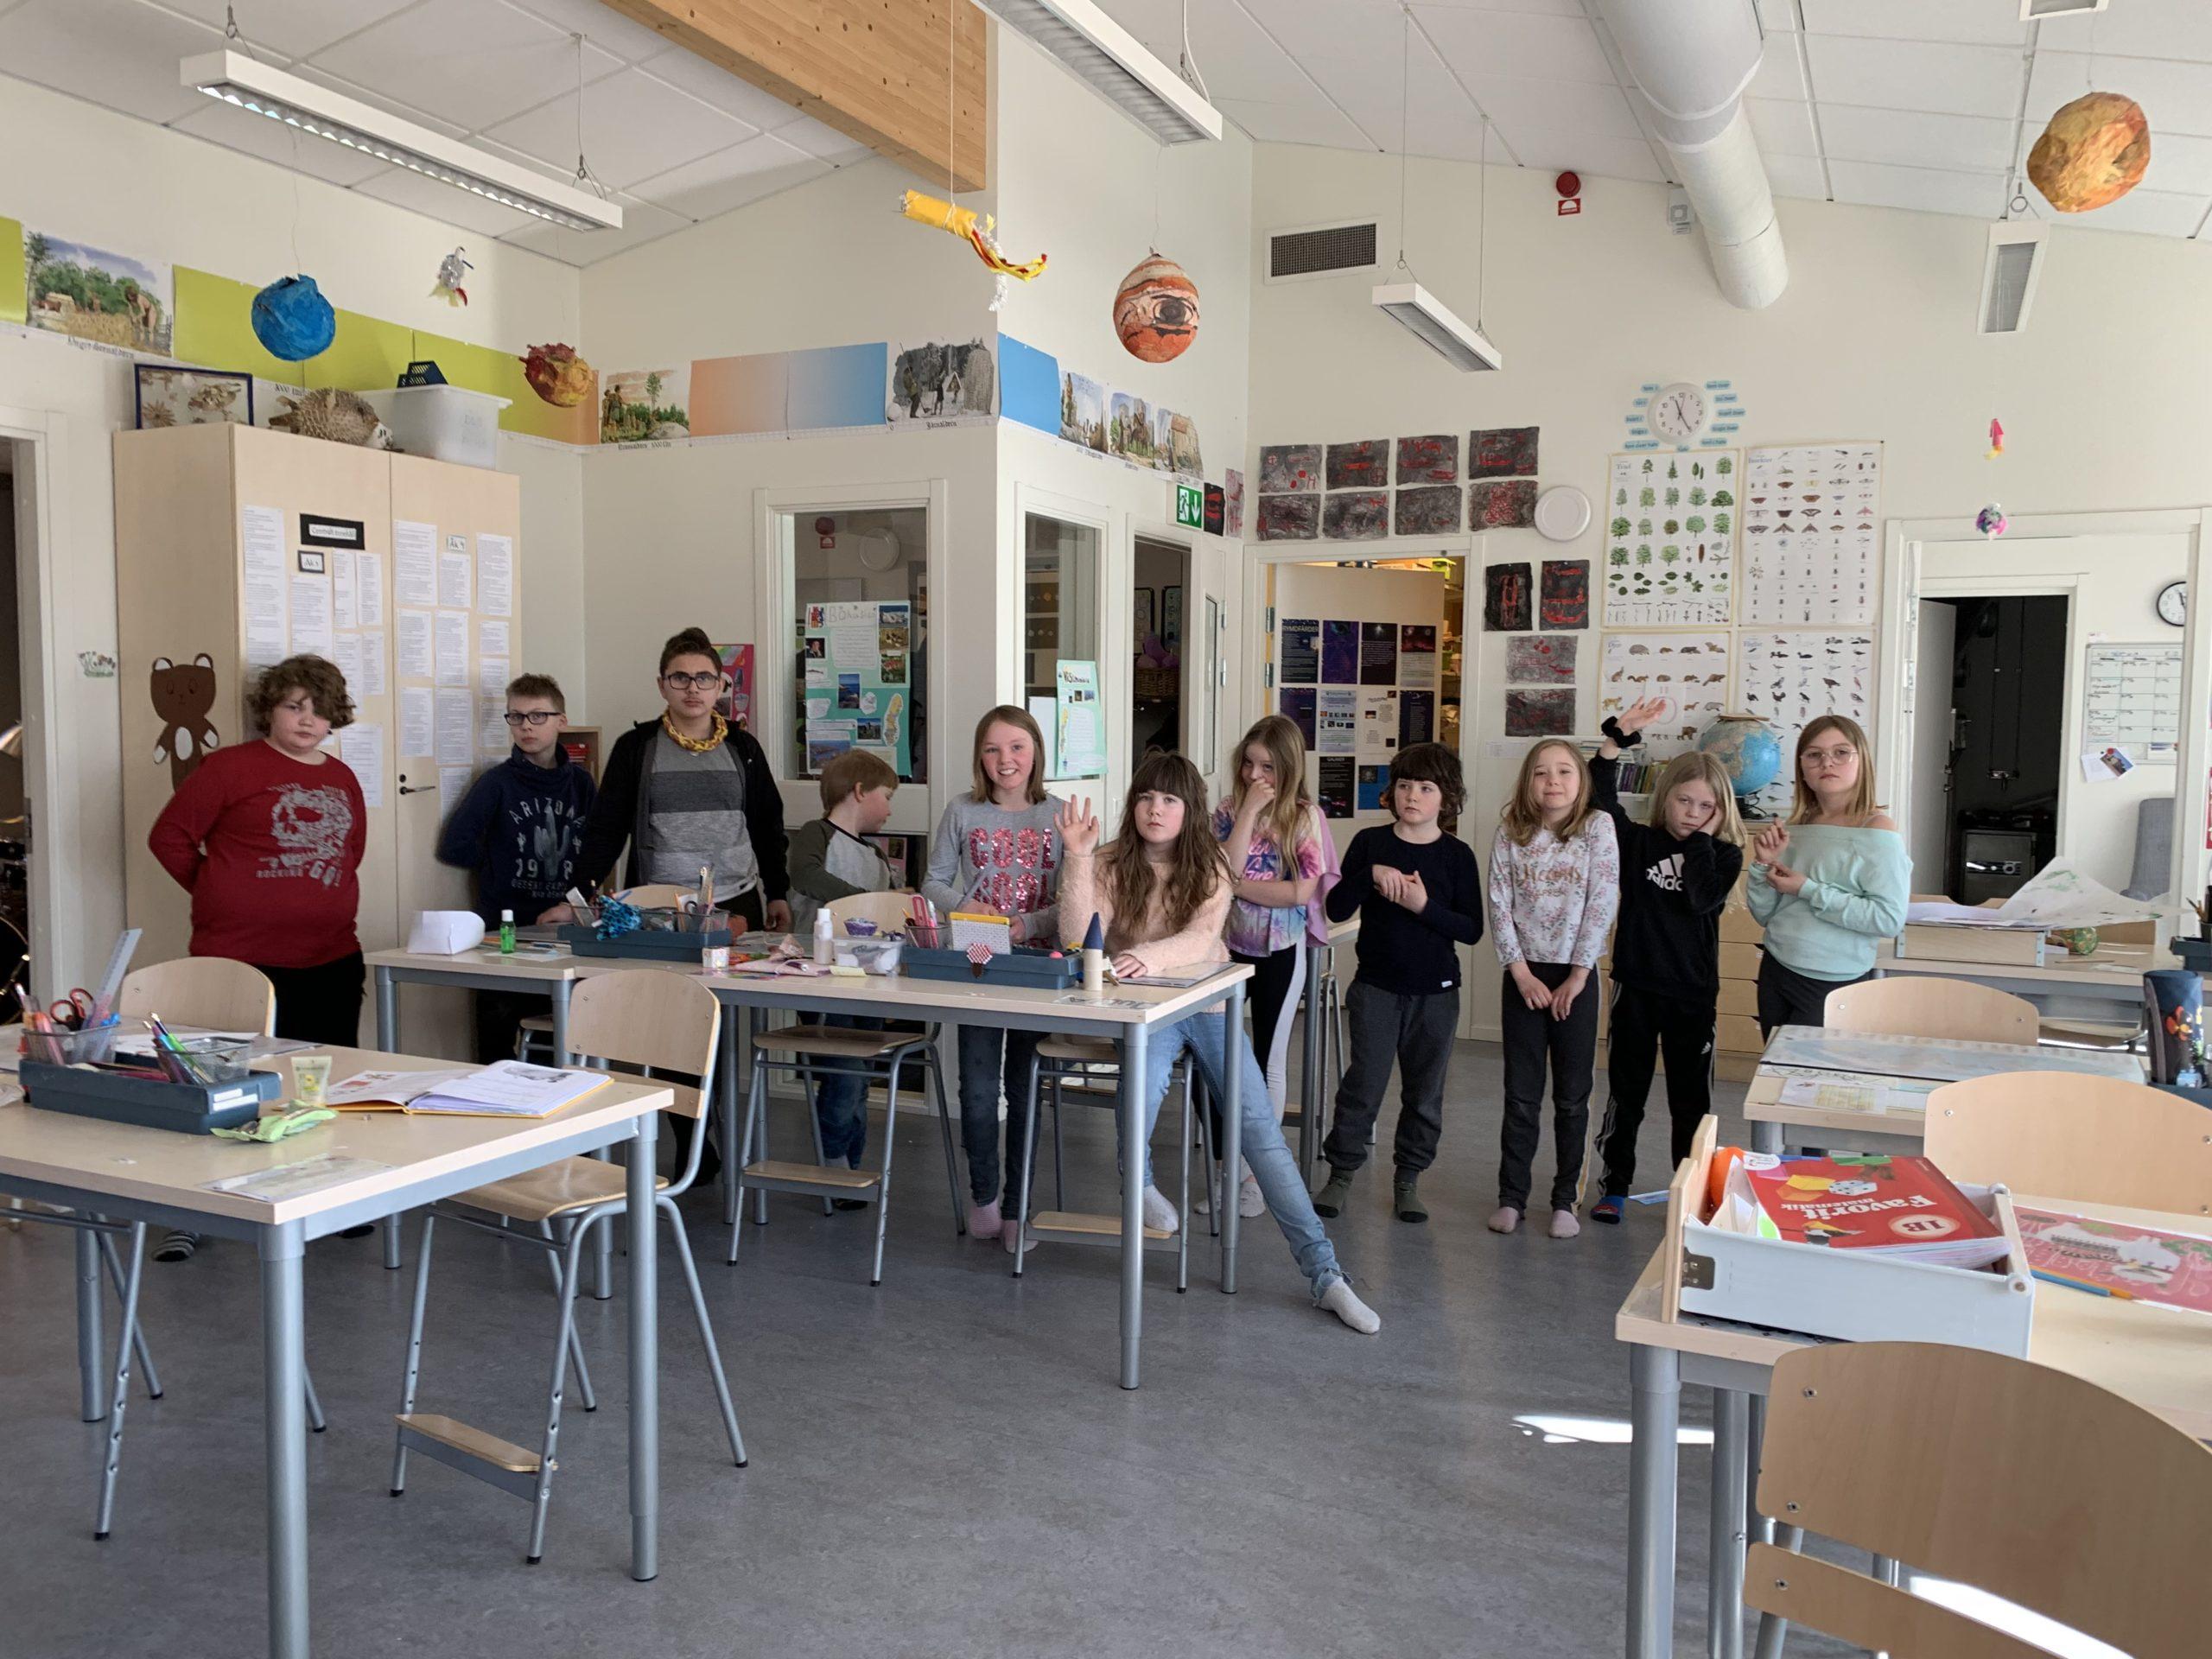 flera barn i ett klassrum